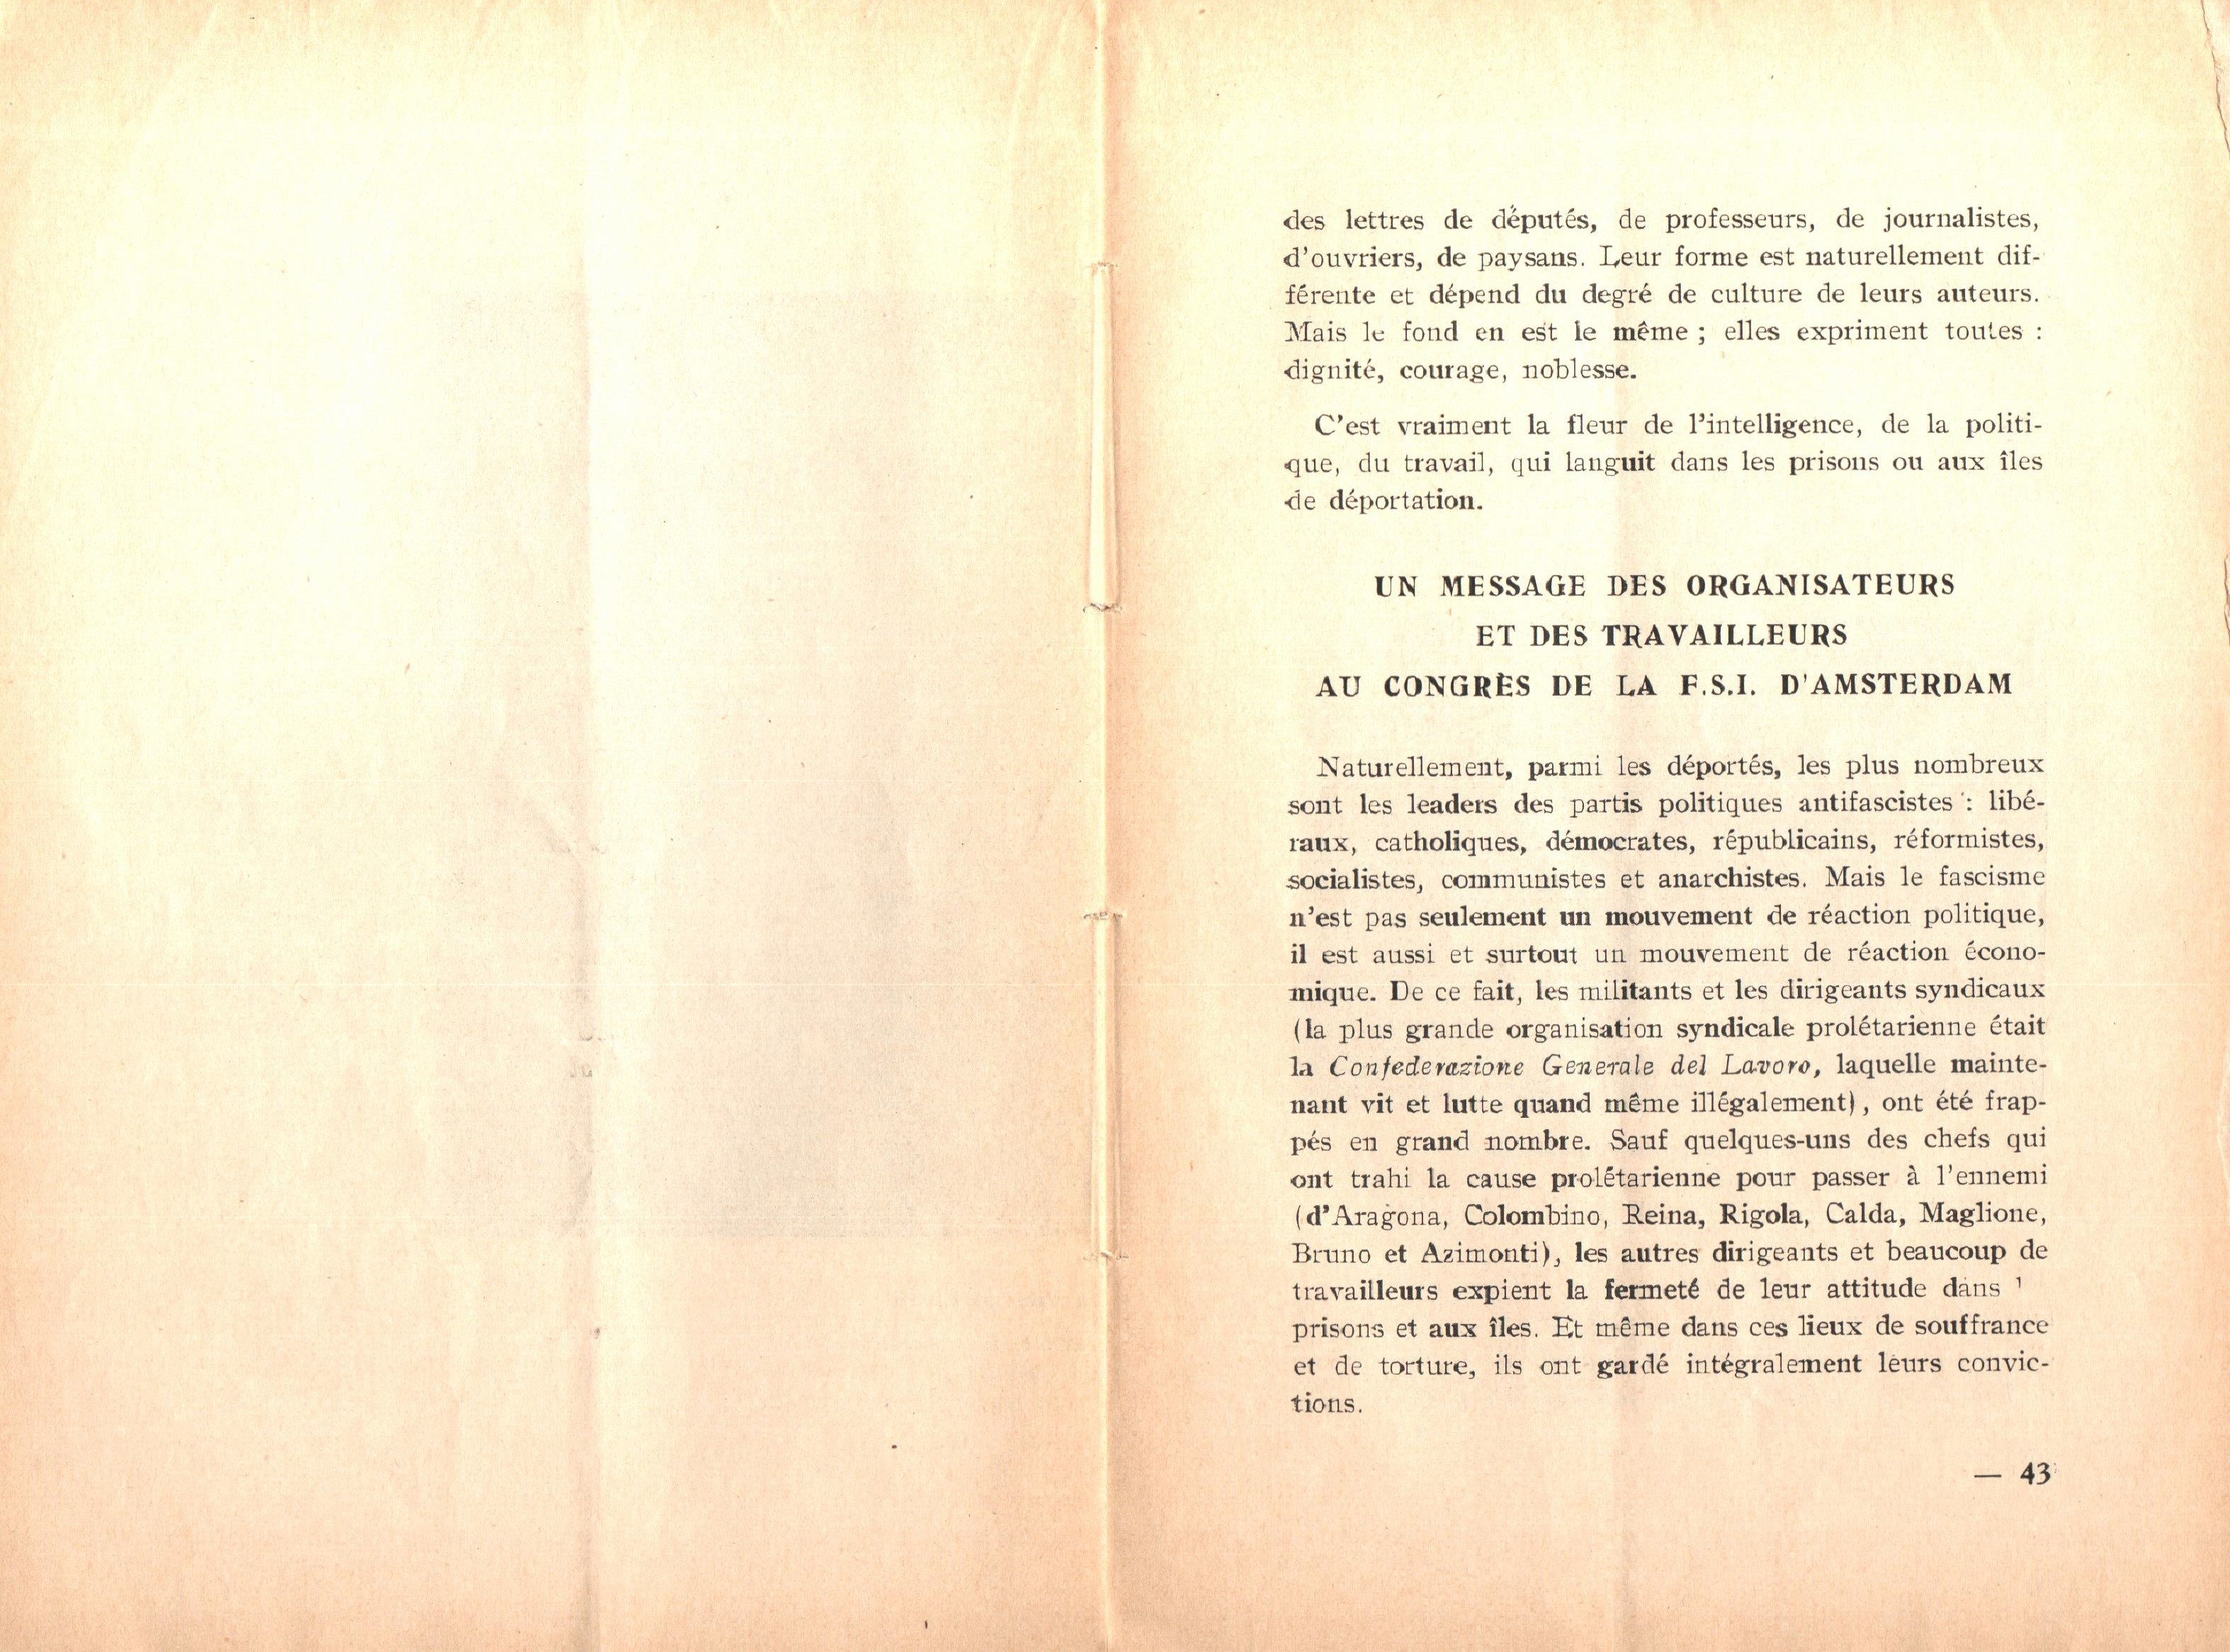 Nicola Cilla, Les «Cayennes» d'Italie - pag. 23